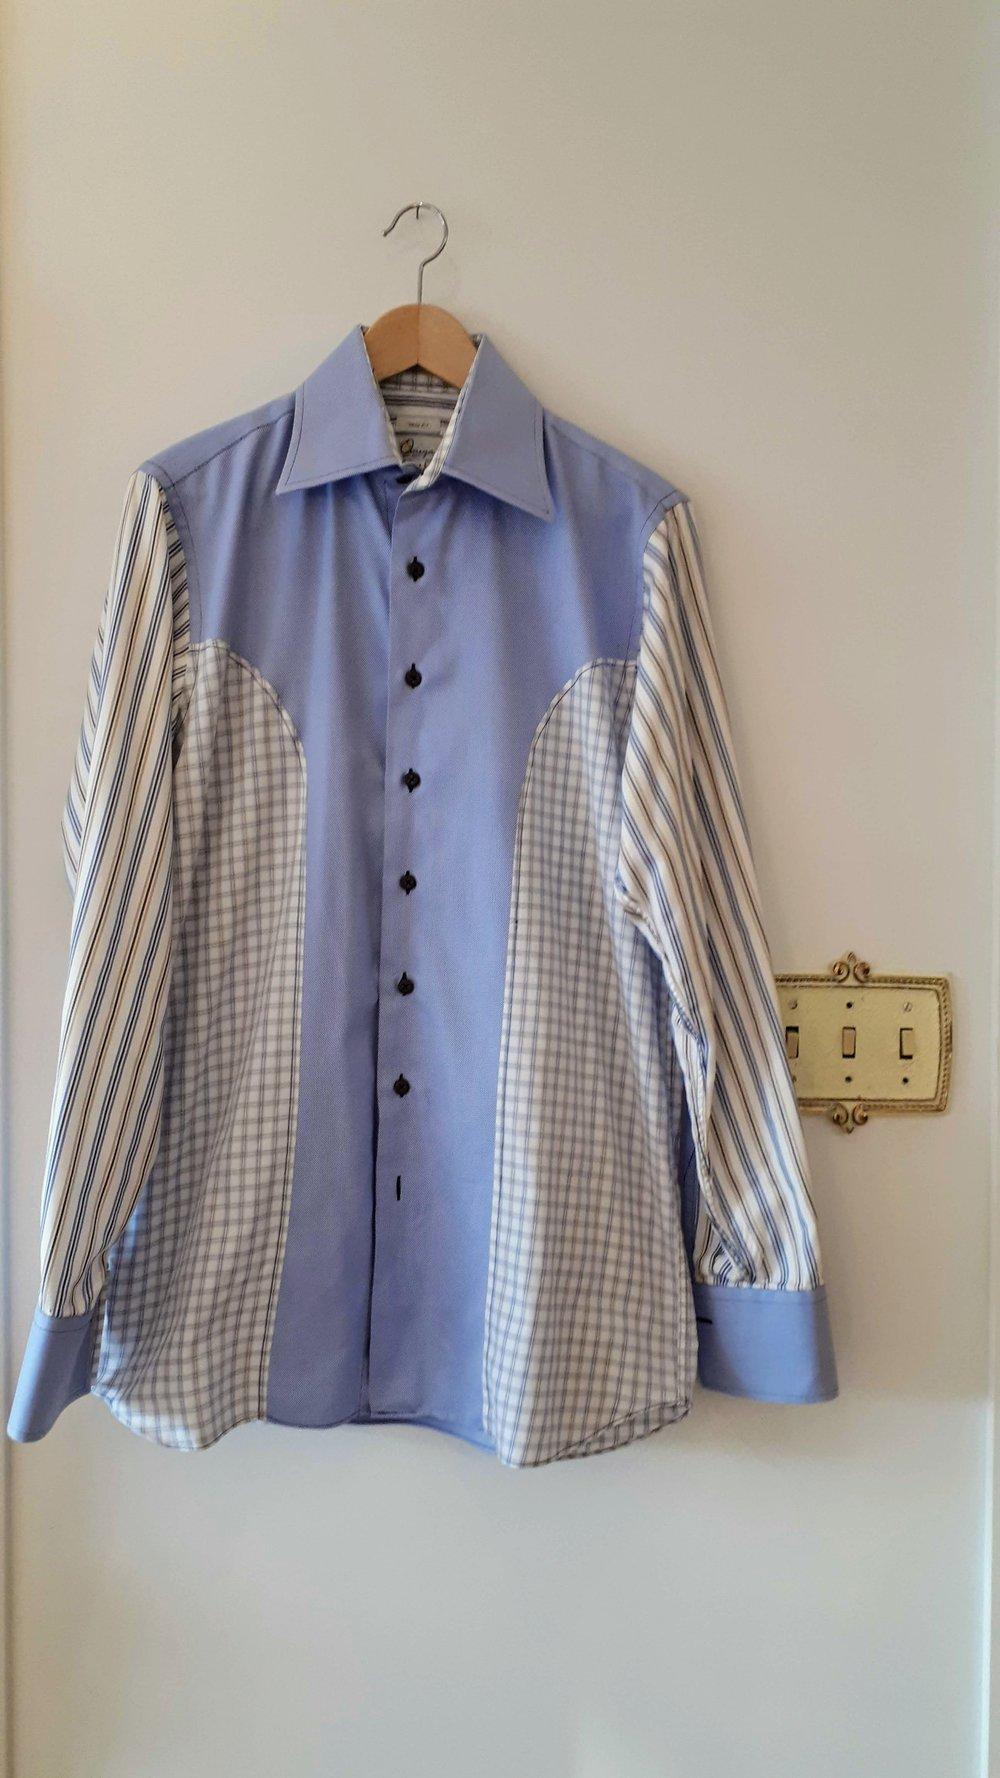 Omega bespoke mens shirt; Size L, $28